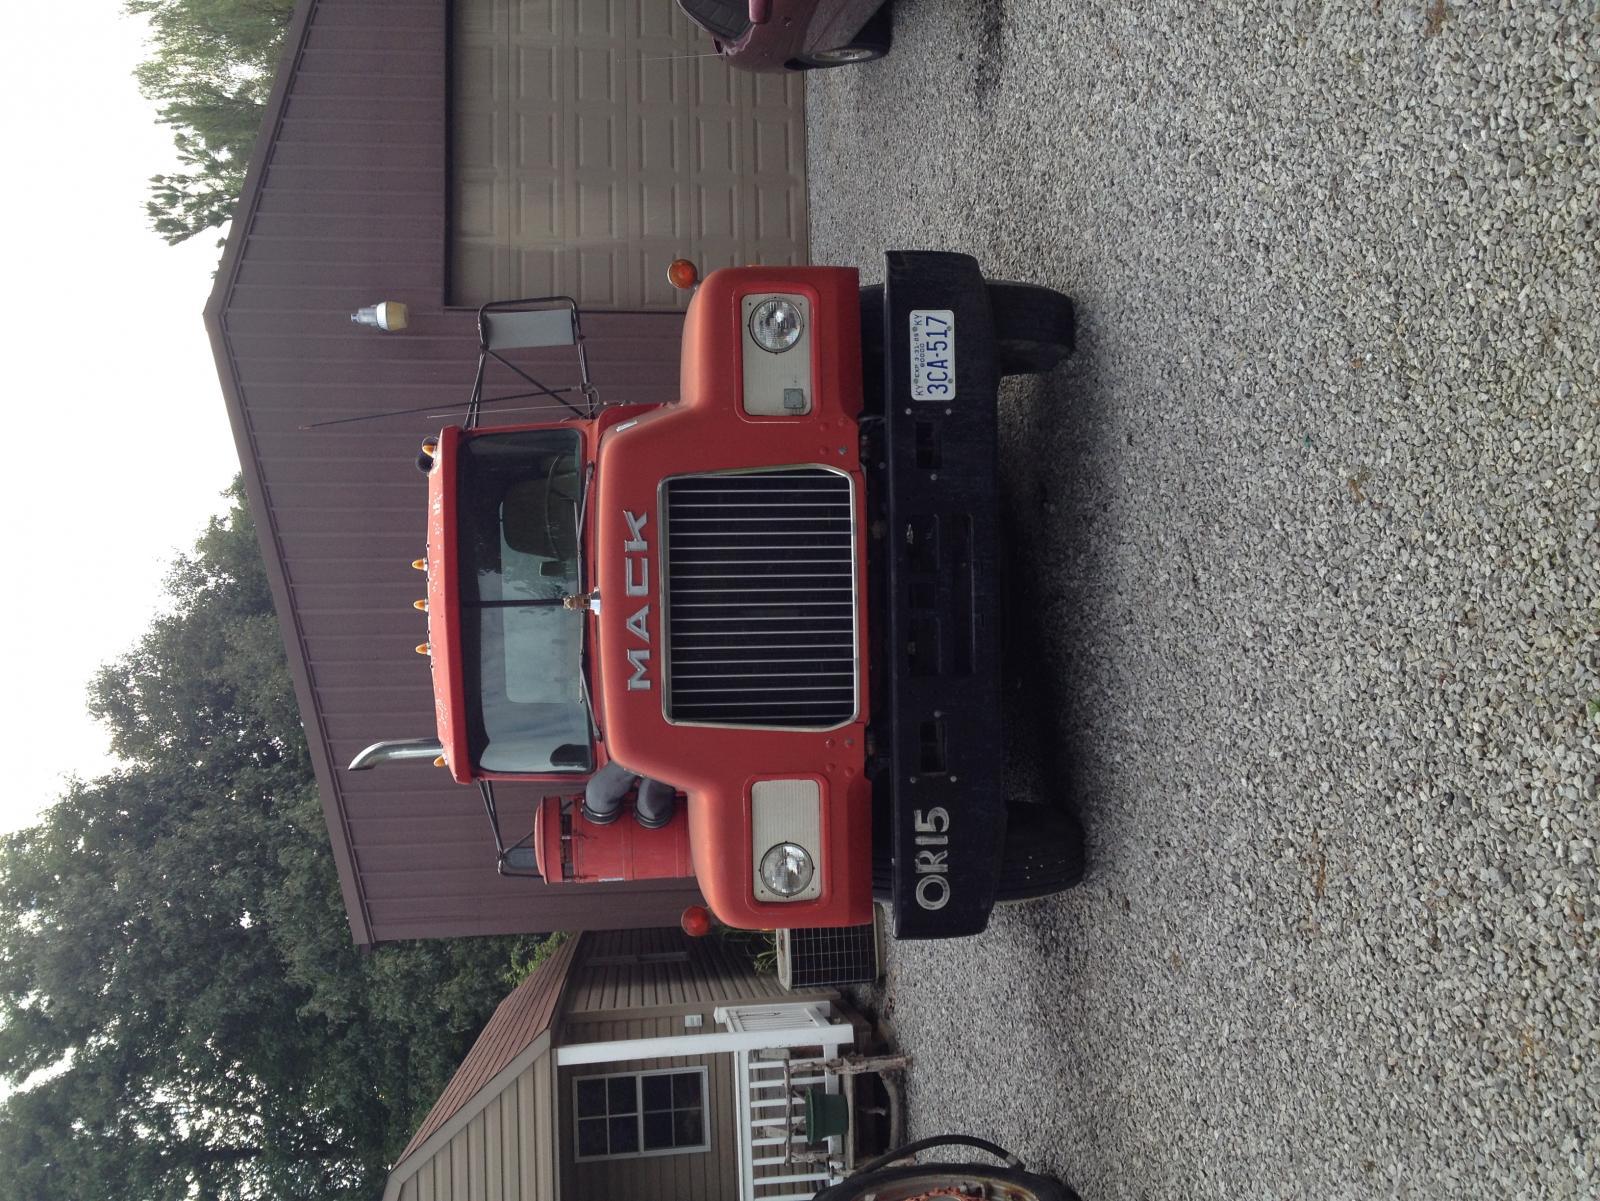 Mack R Model Lowboy Tractor 126 758 Miles